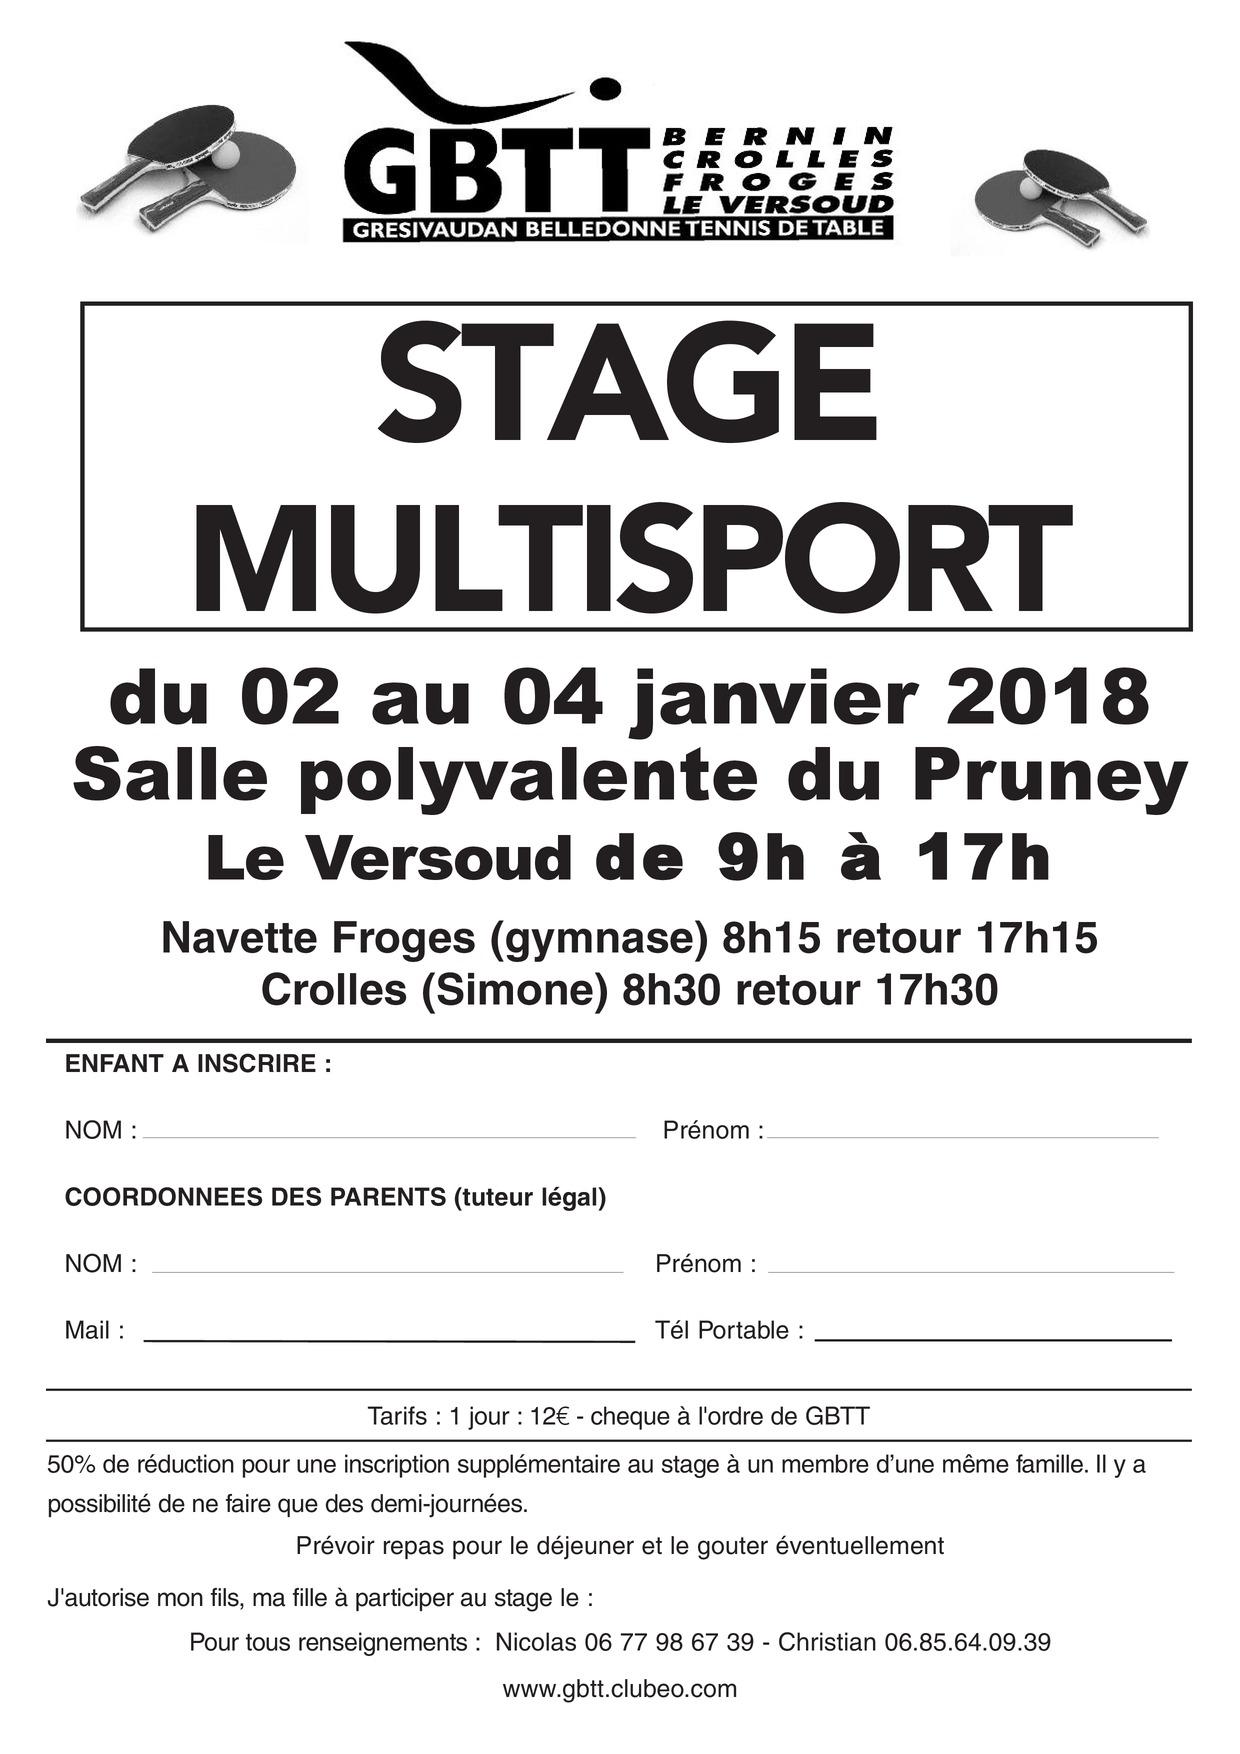 Actualite Stage Club Tennis De Table Gresivaudan Belledonne